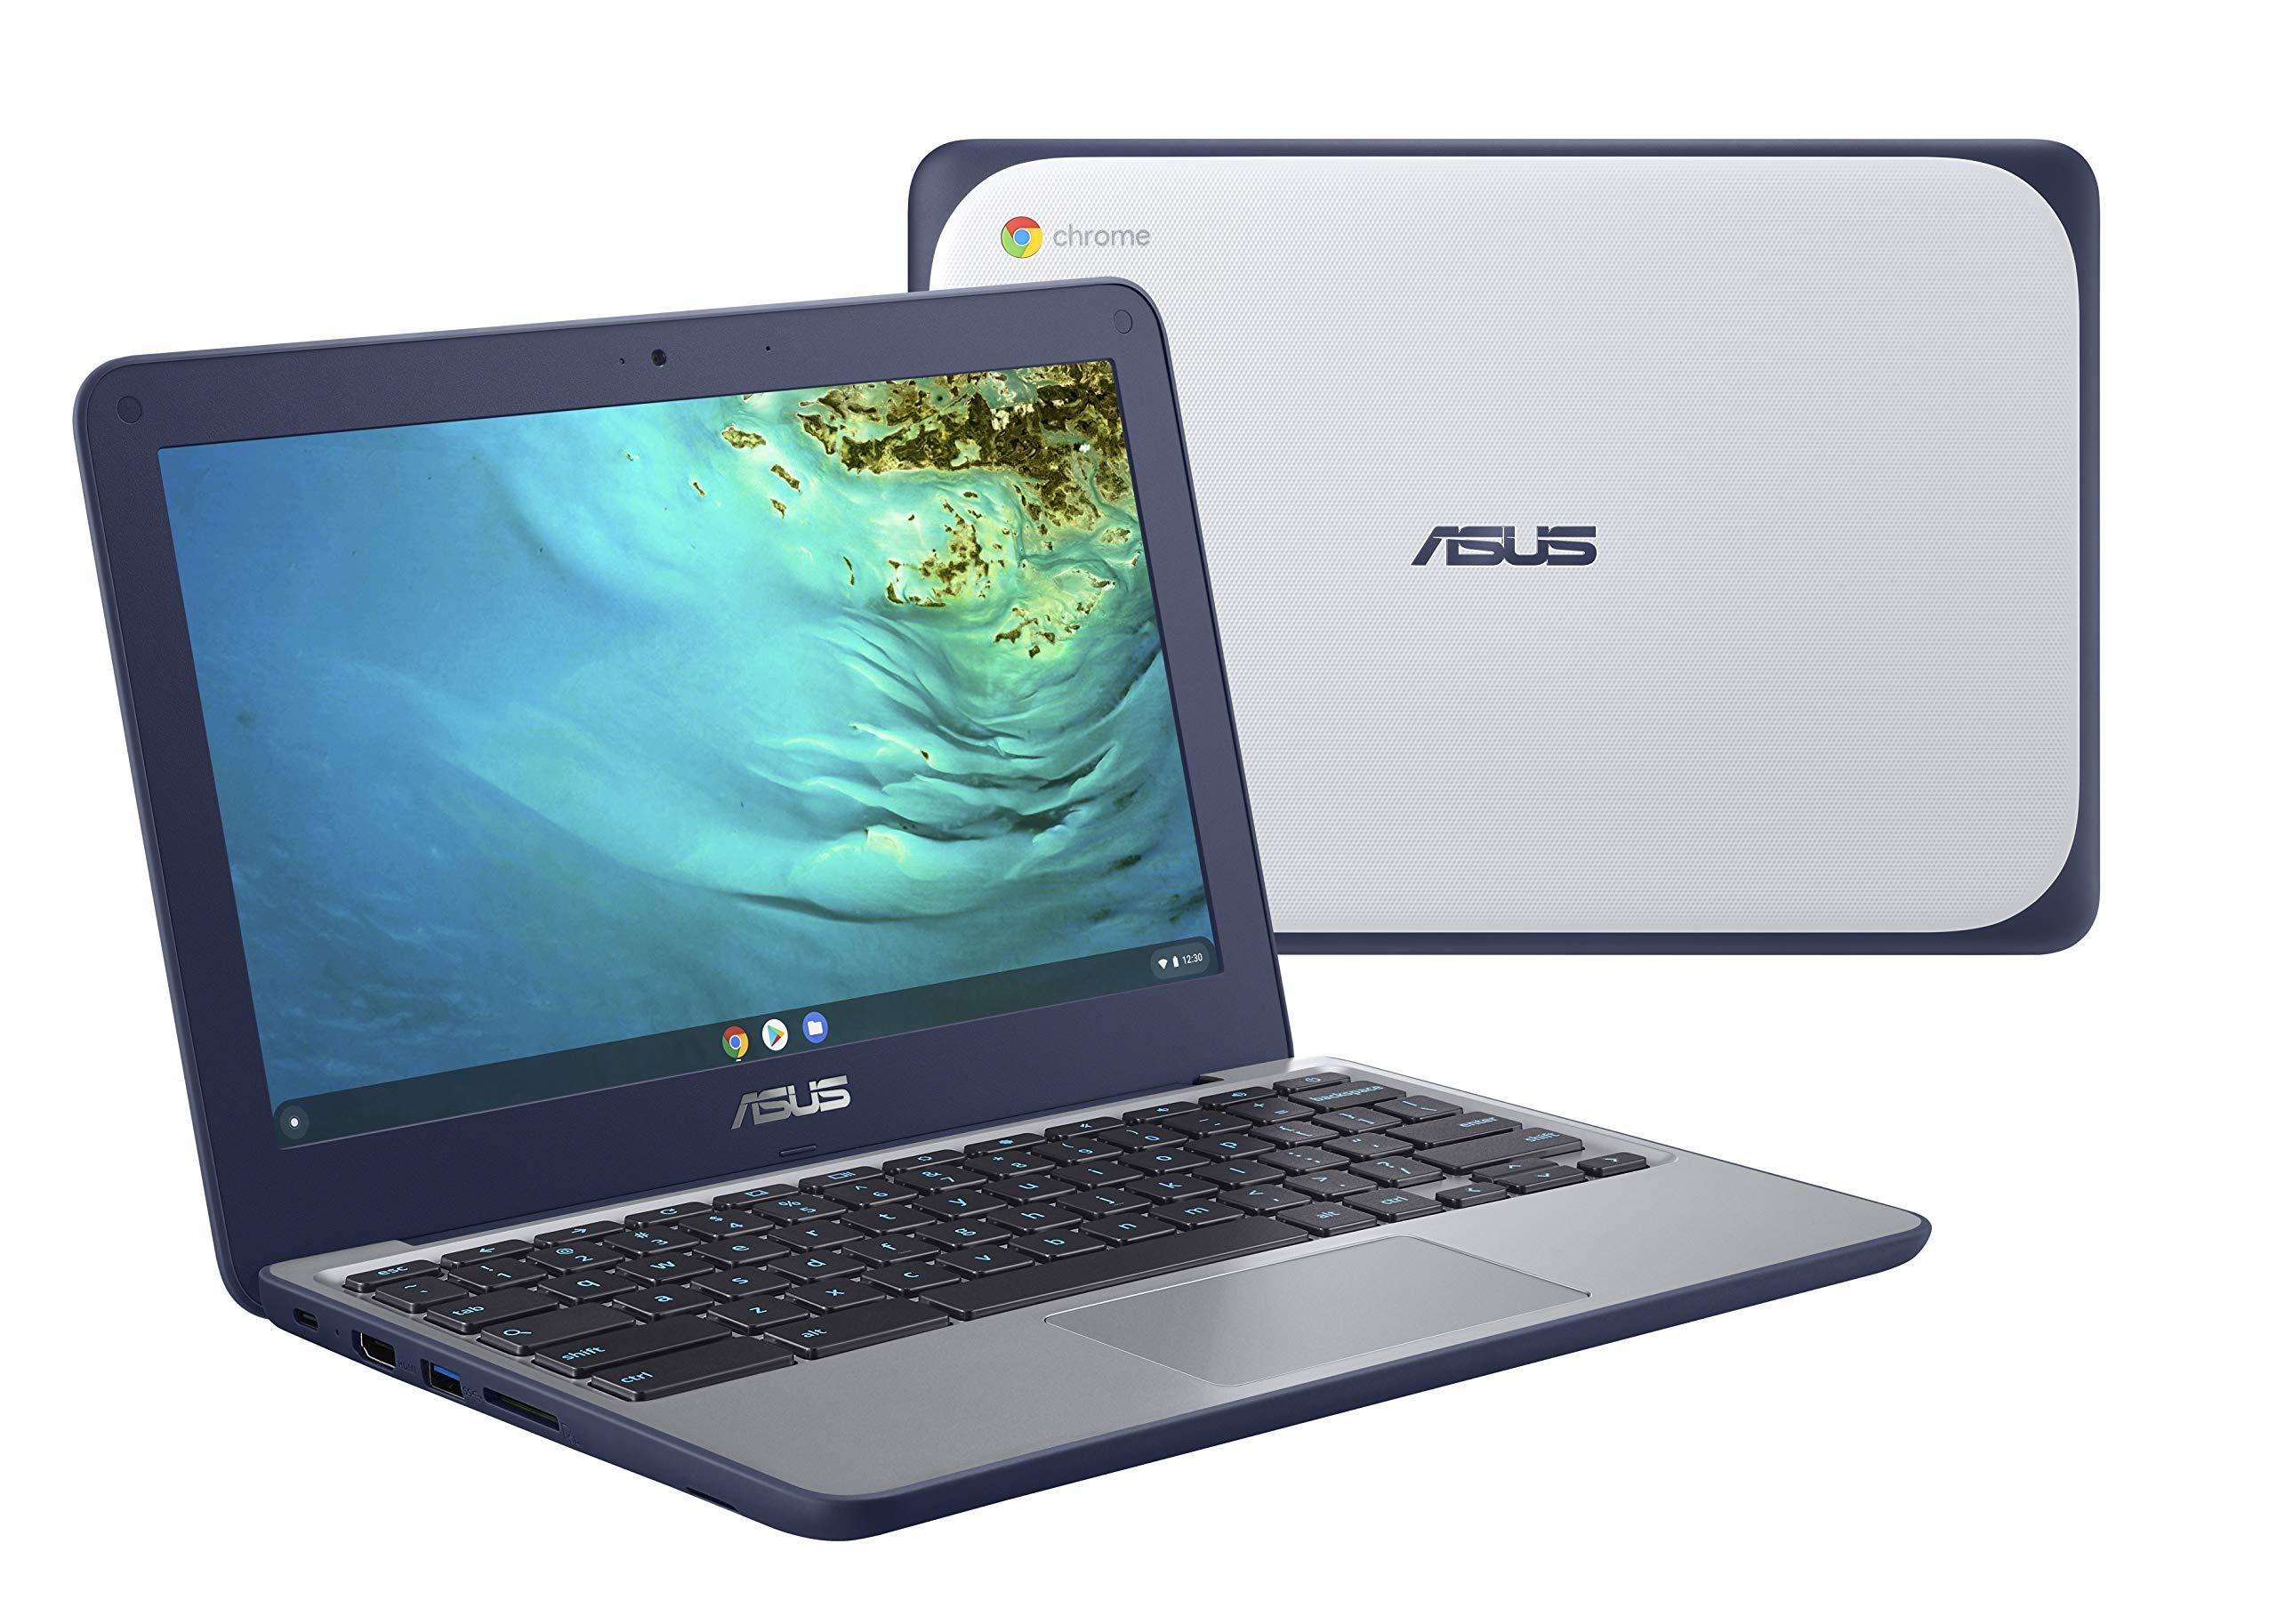 "ASUS Chromebook C202XA Rugged & Spill Resistant Laptop, 11.6"" HD, 180 Degree, MediaTek 8173C Processor, 4GB RAM, 32GB Storage, MIL-STD 810G Durability, Blue, Education, Chrome OS, C202XA-YB04-BL"